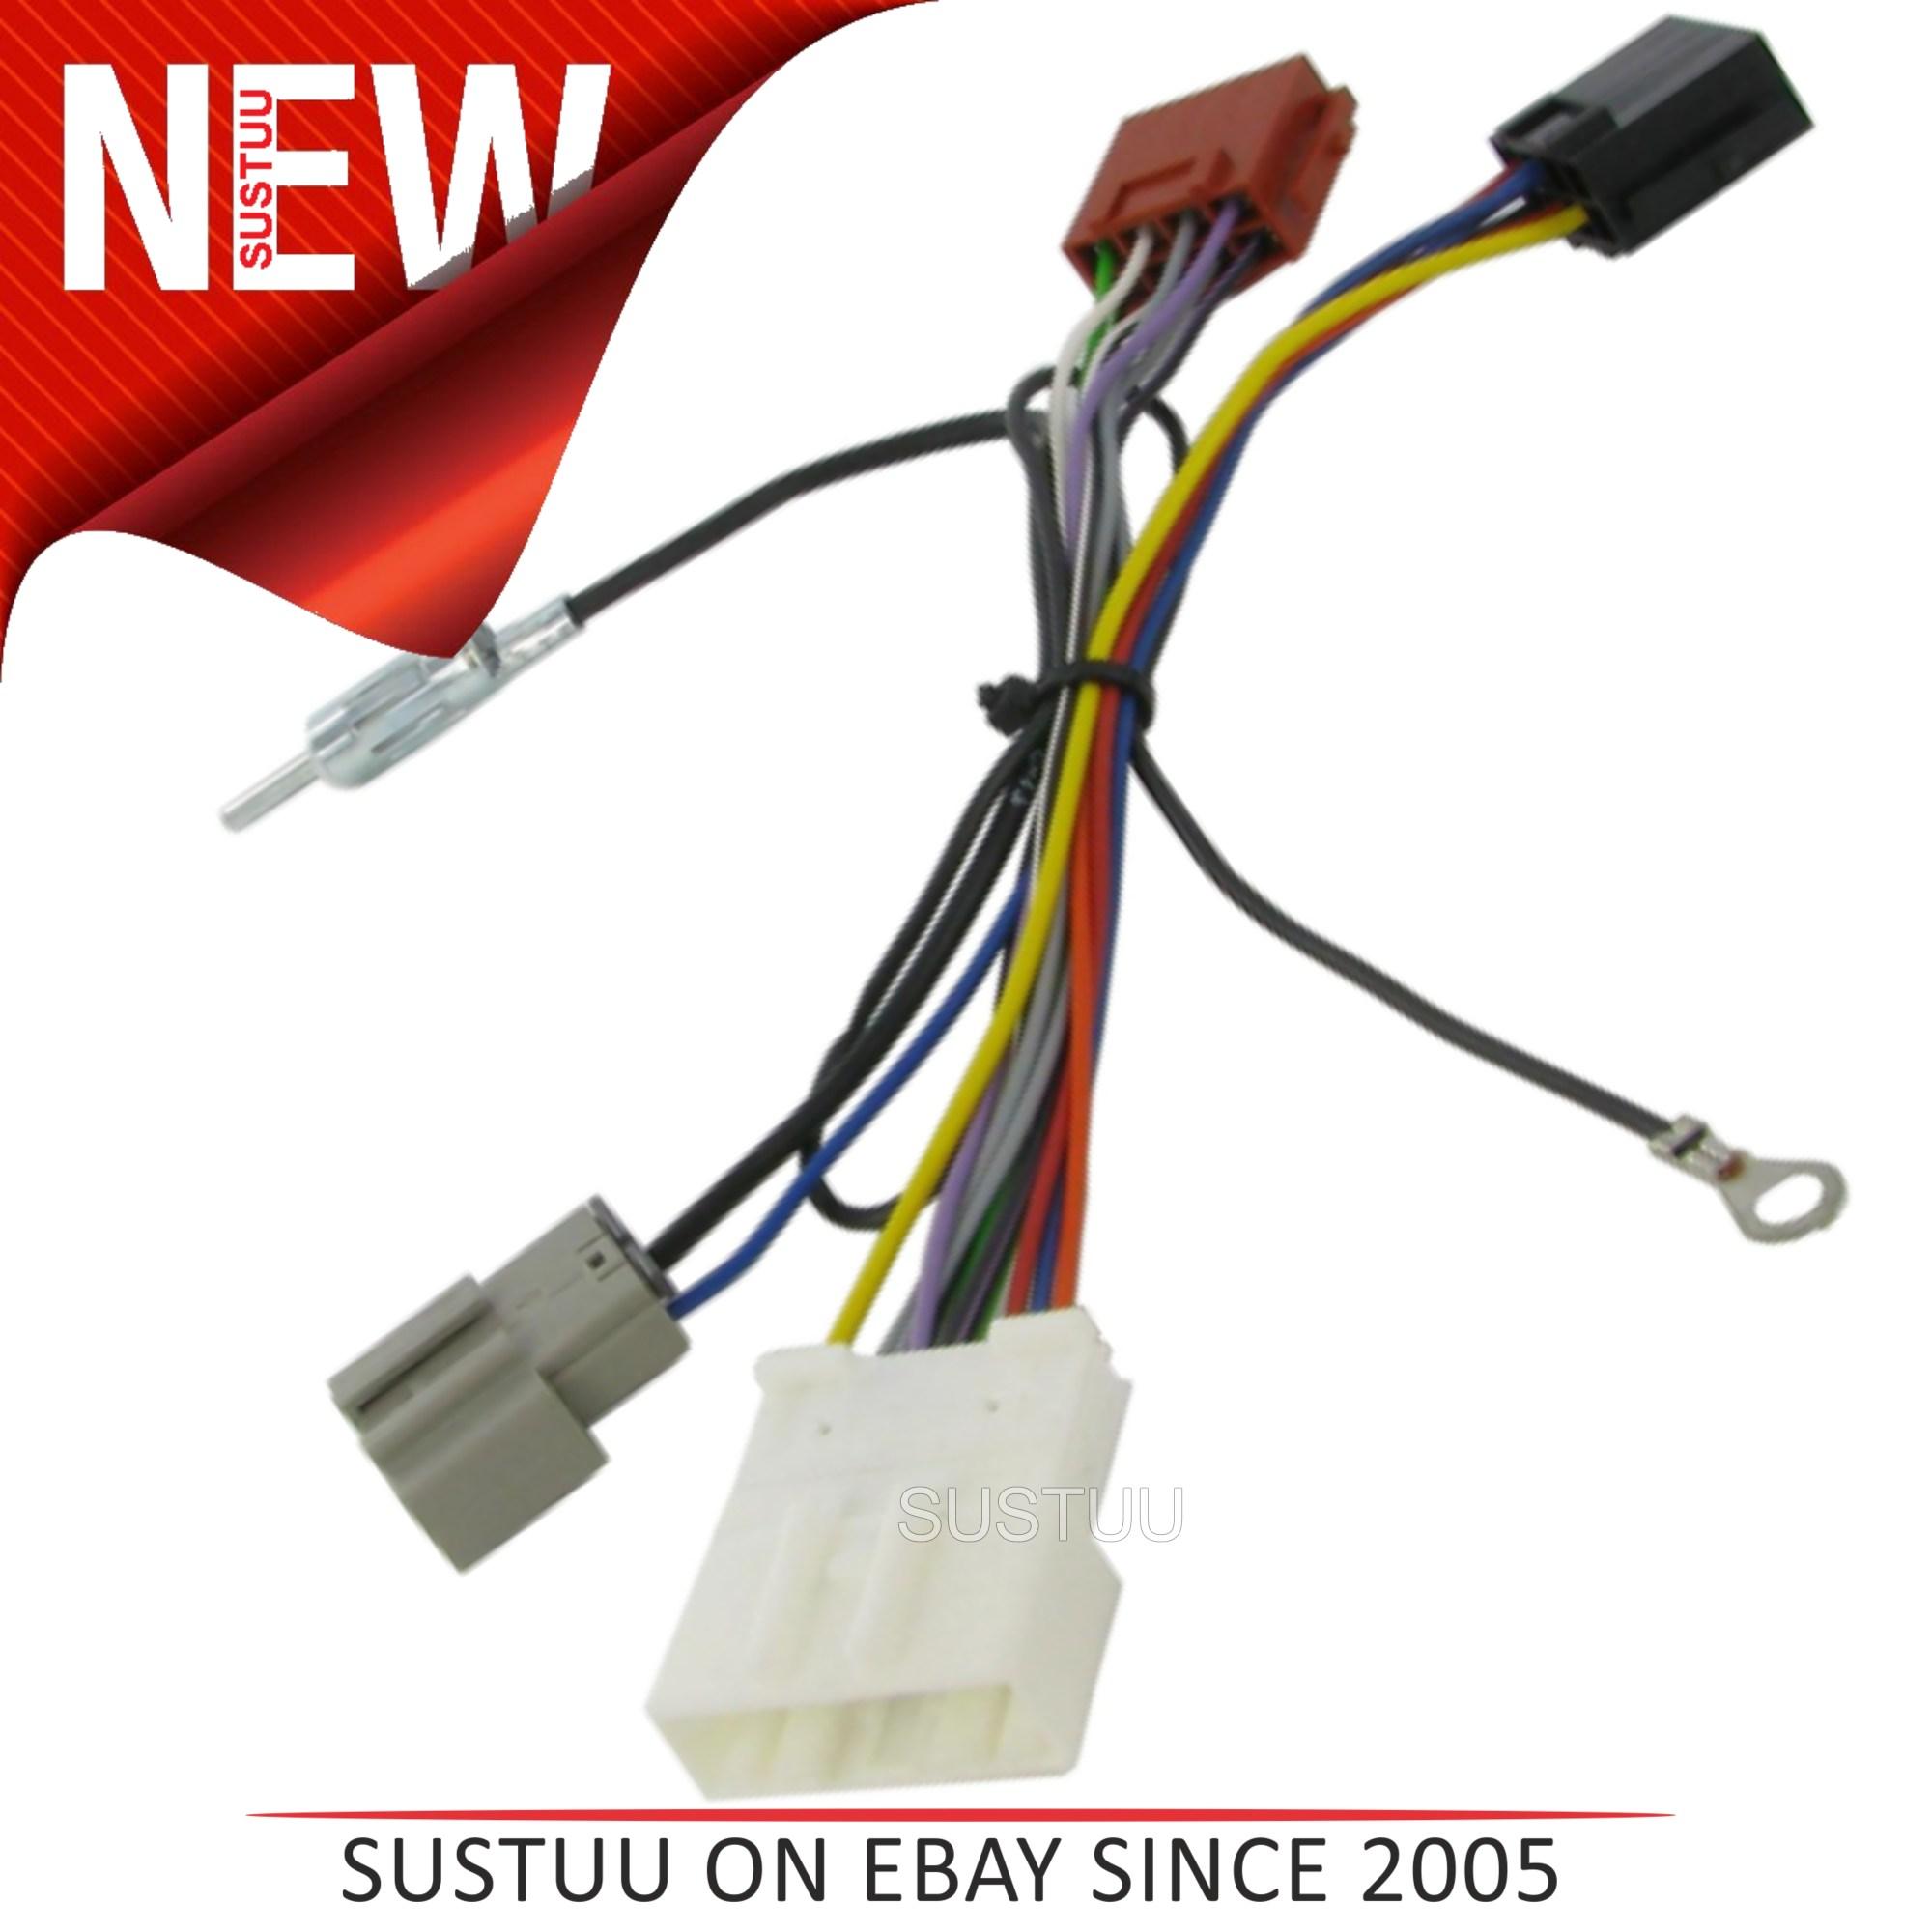 hight resolution of c2 20ns06 car stereo iso wiring fakra harness adaptor nissan qashqai 2007 sustuu